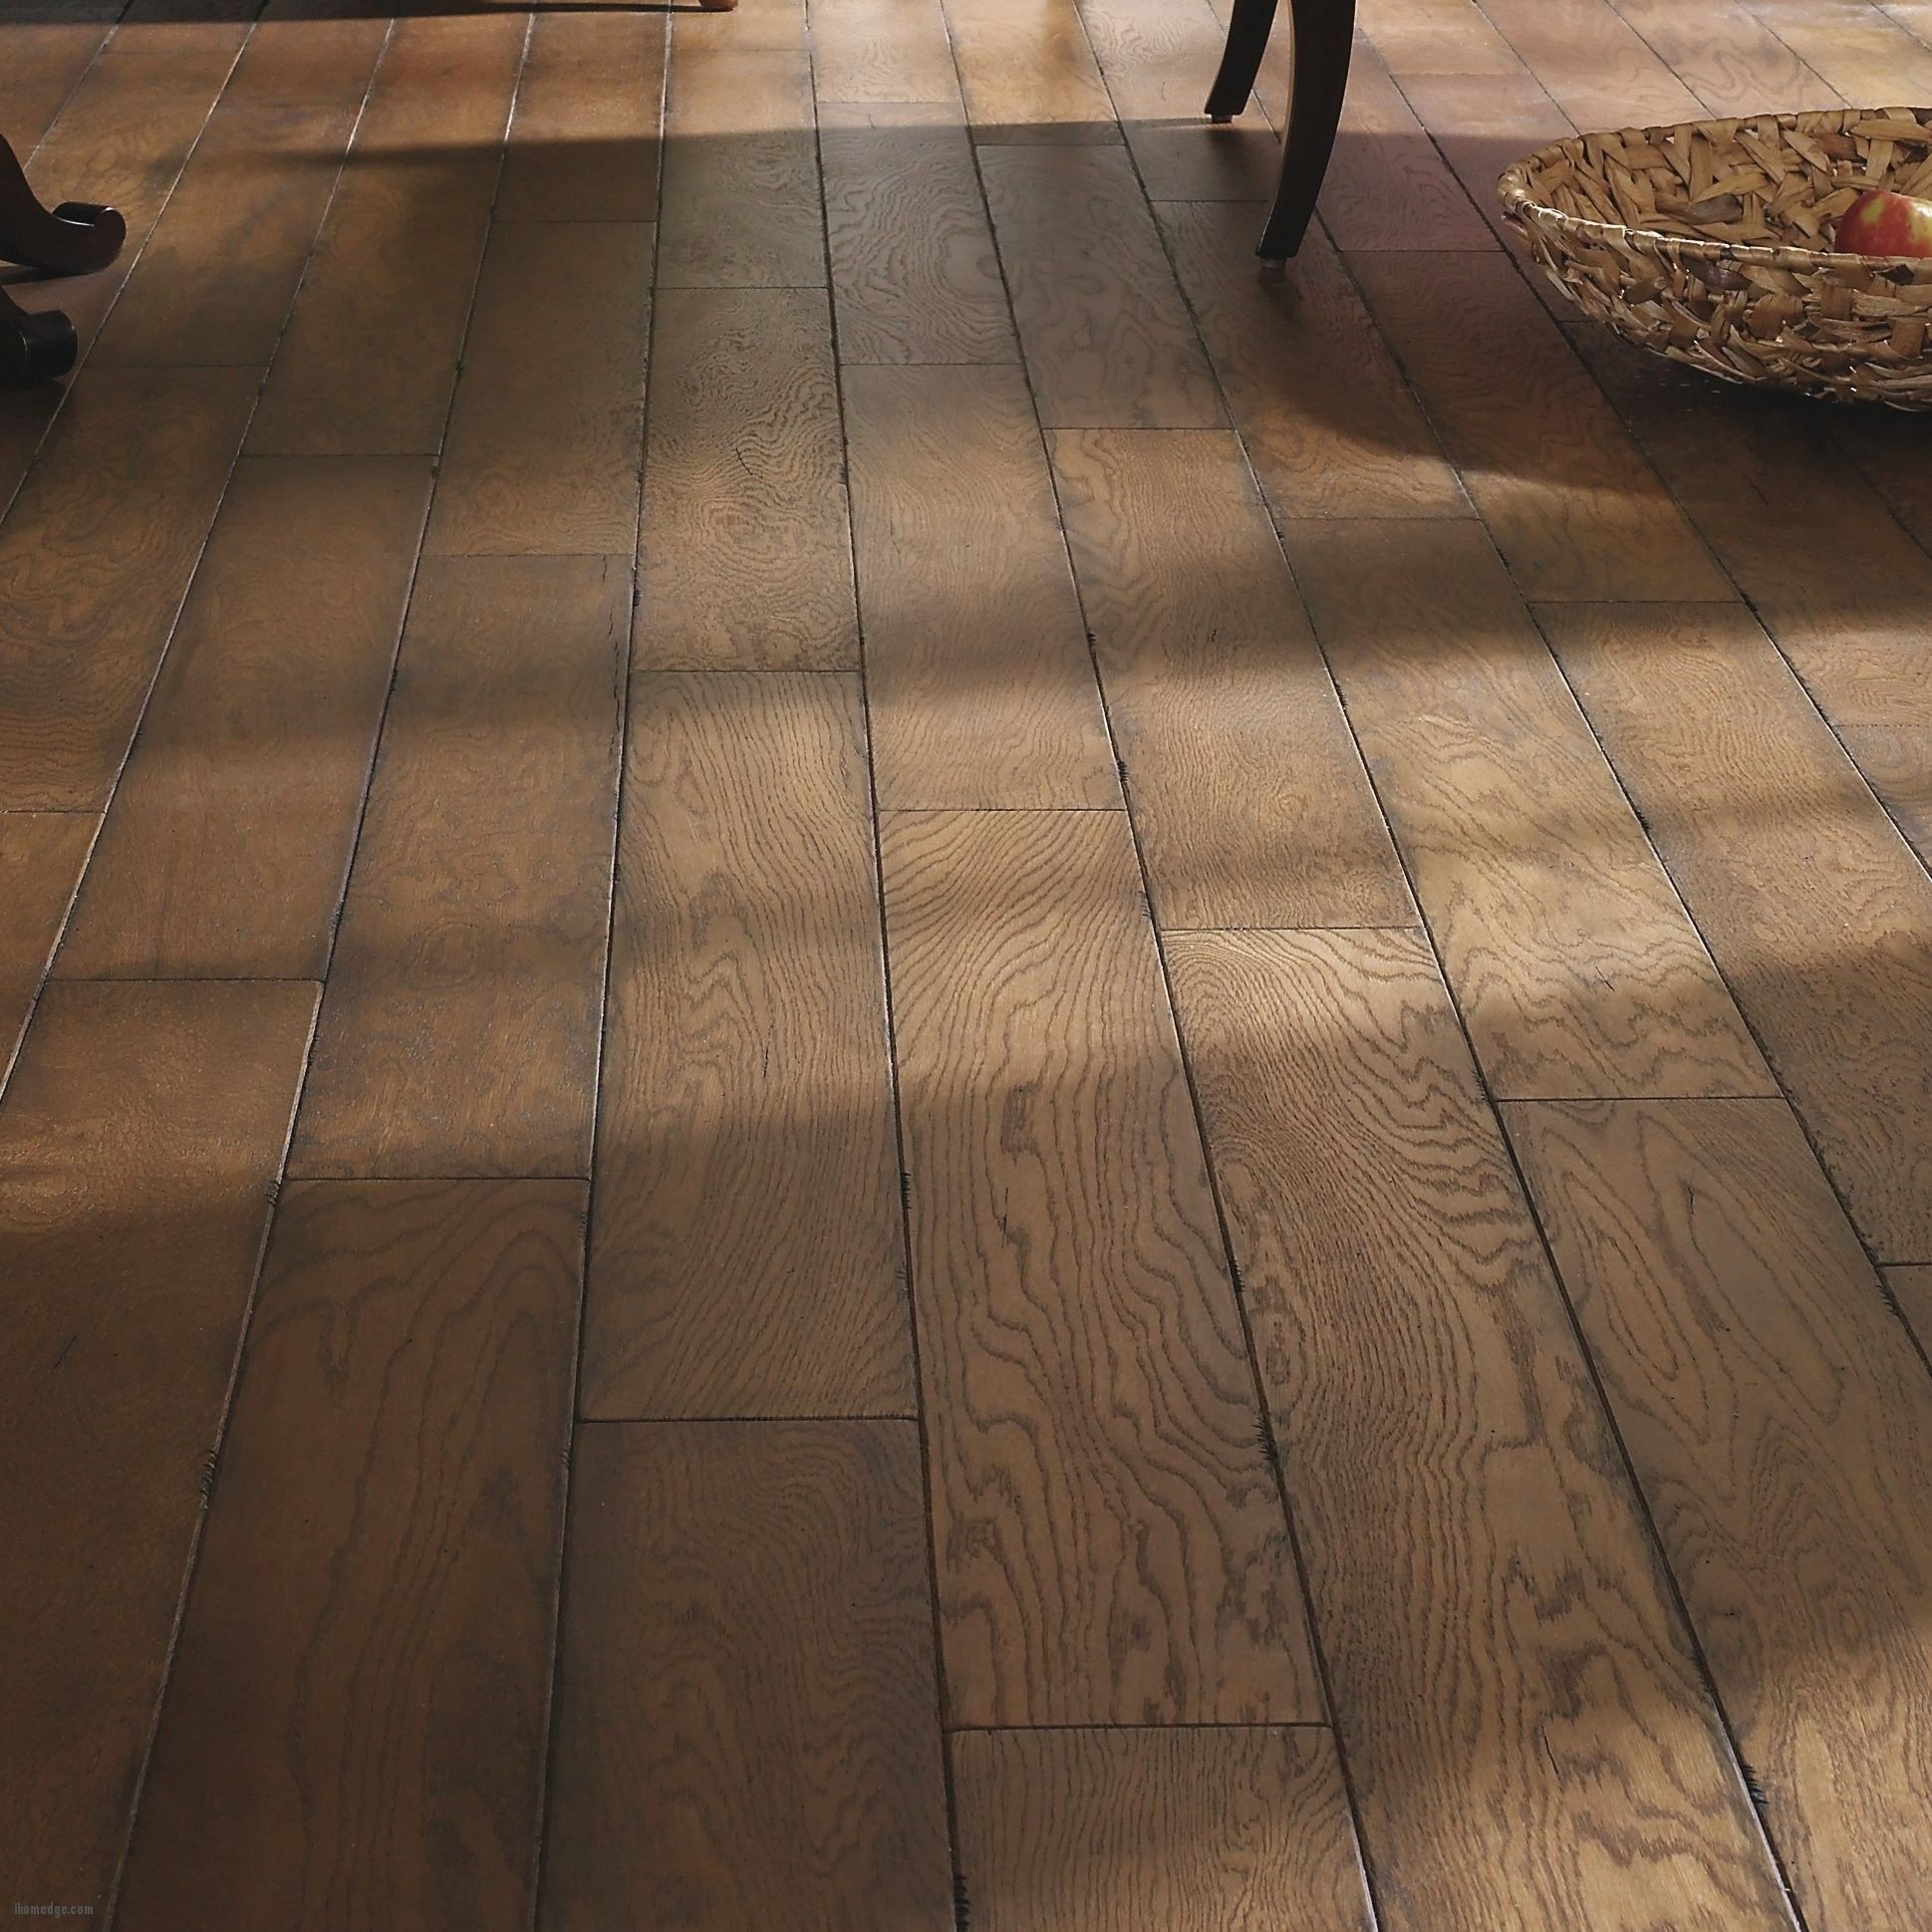 hardwood floor refinishing chattanooga tn of hardwood floor outlet floor plan ideas intended for hardwood floor outlet hardwood plank flooring